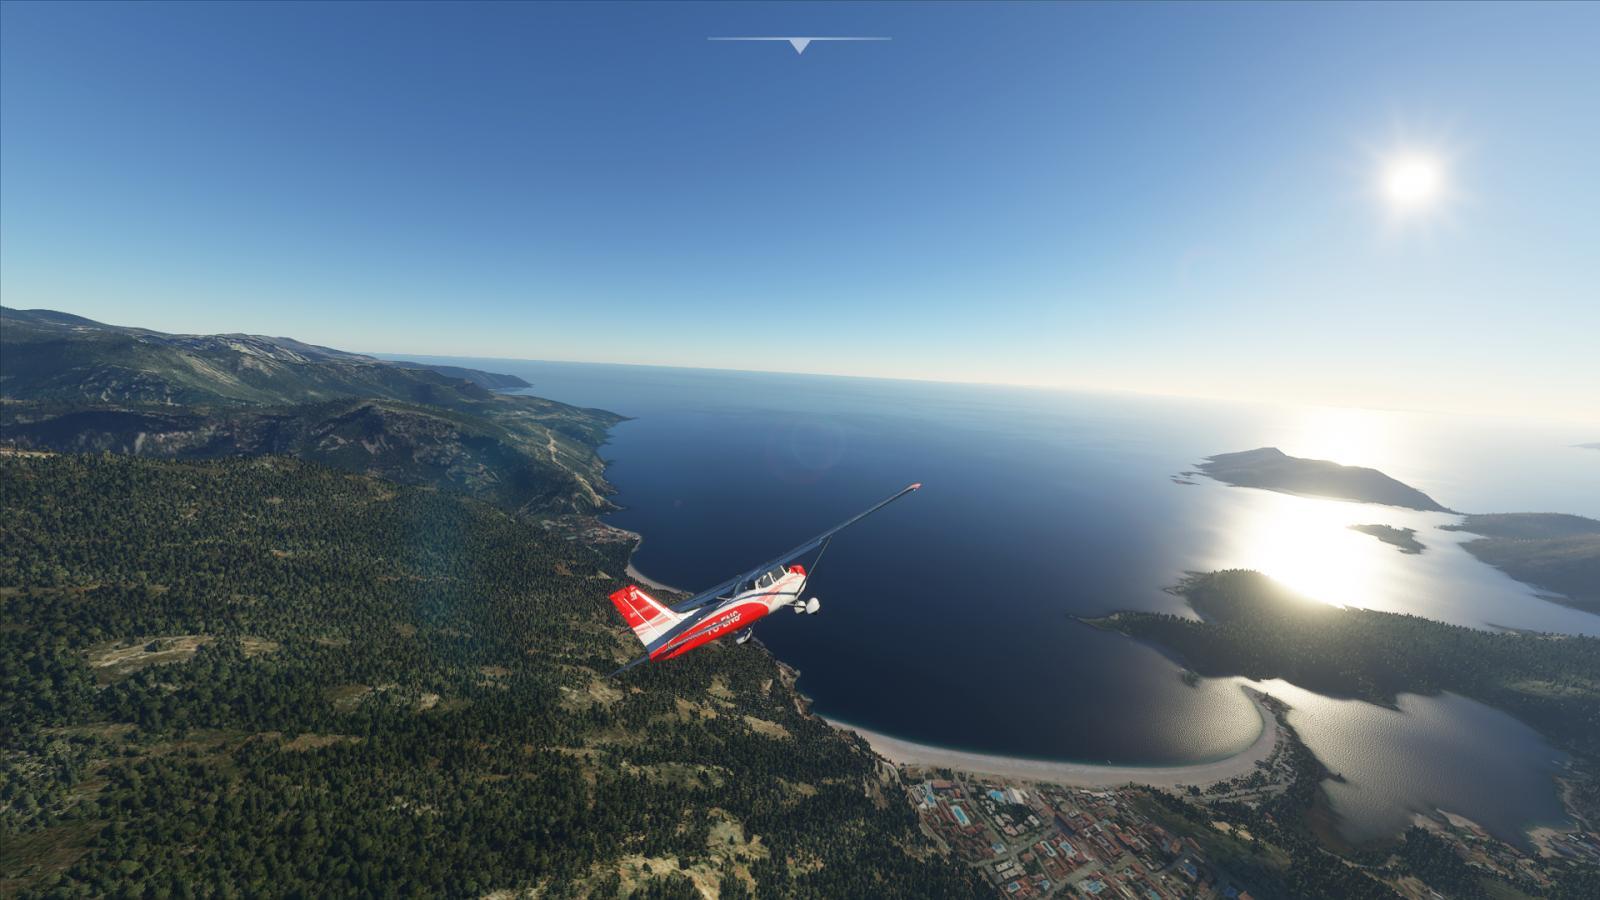 İsim:  Microsoft Flight Simulator Screenshot 2020.08.27 - 20.03.08.12.jpg Görüntüleme: 166 Büyüklük:  136.5 KB (Kilobyte)